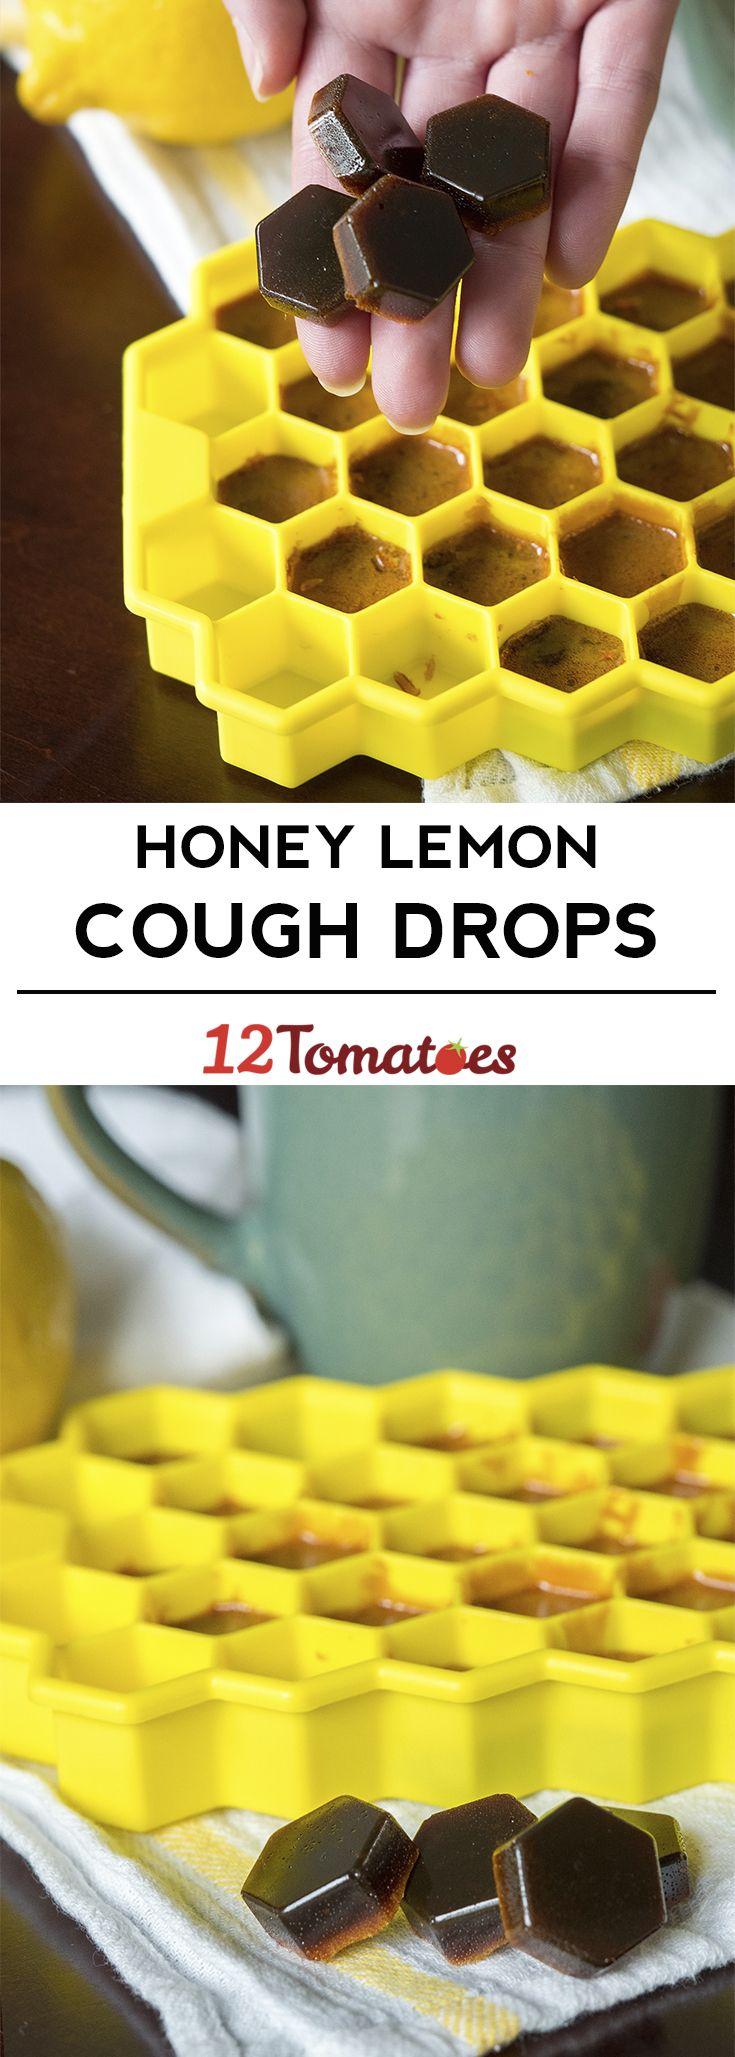 Homemade Honey Lemon Cough Drops